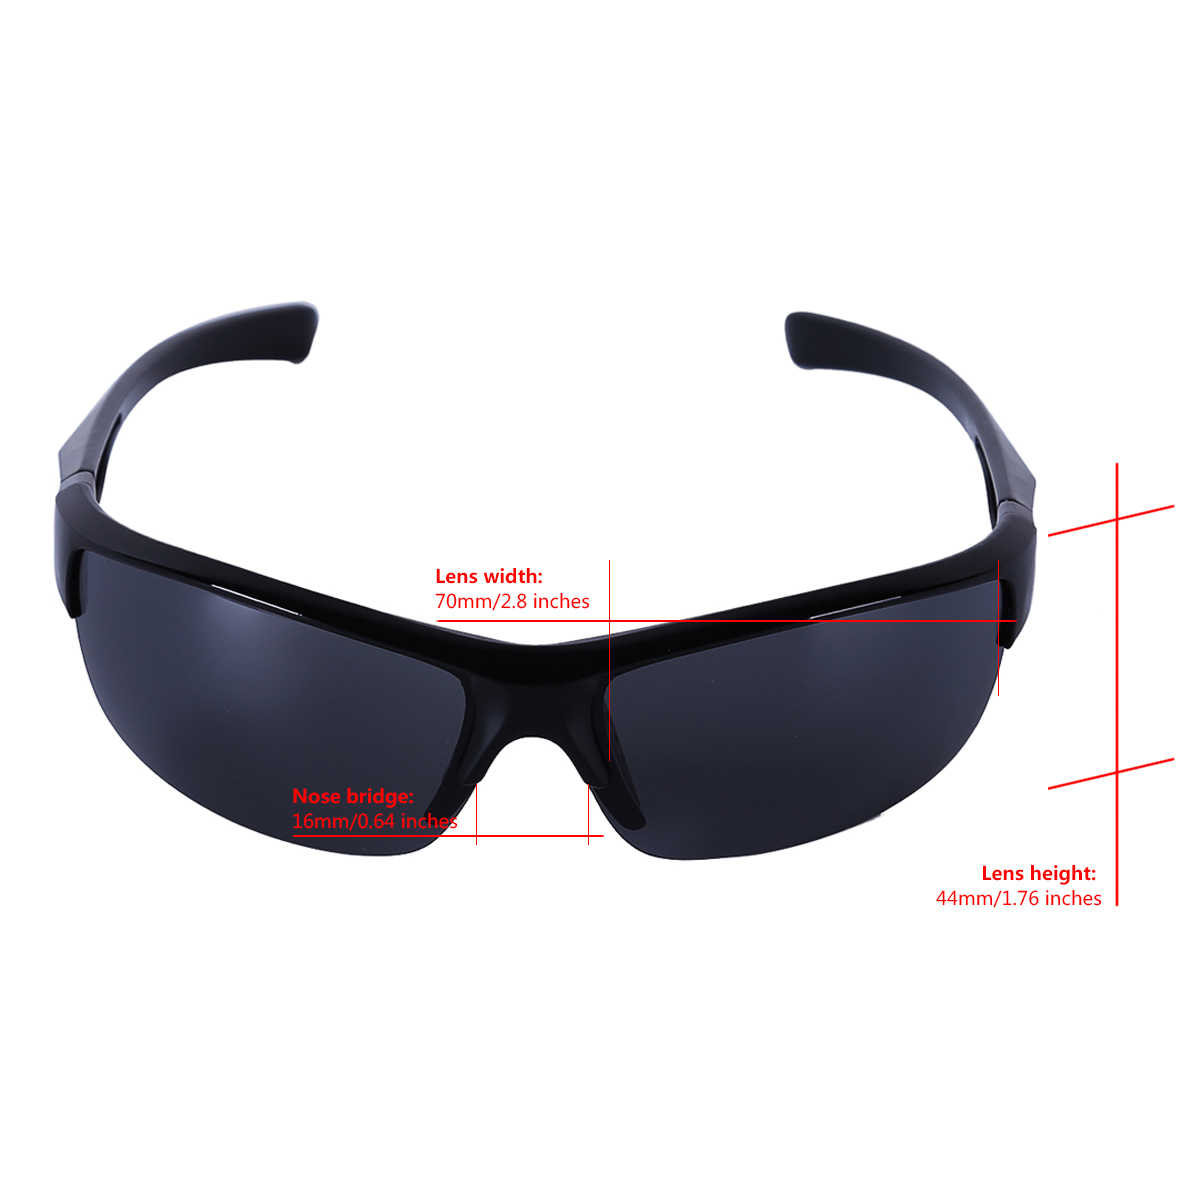 Gafas de sol de moda DPOIS para hombre gafas de sol deportivas UV 400 gafas de sol de Golf para mujer gafas de ciclismo gafas de pesca